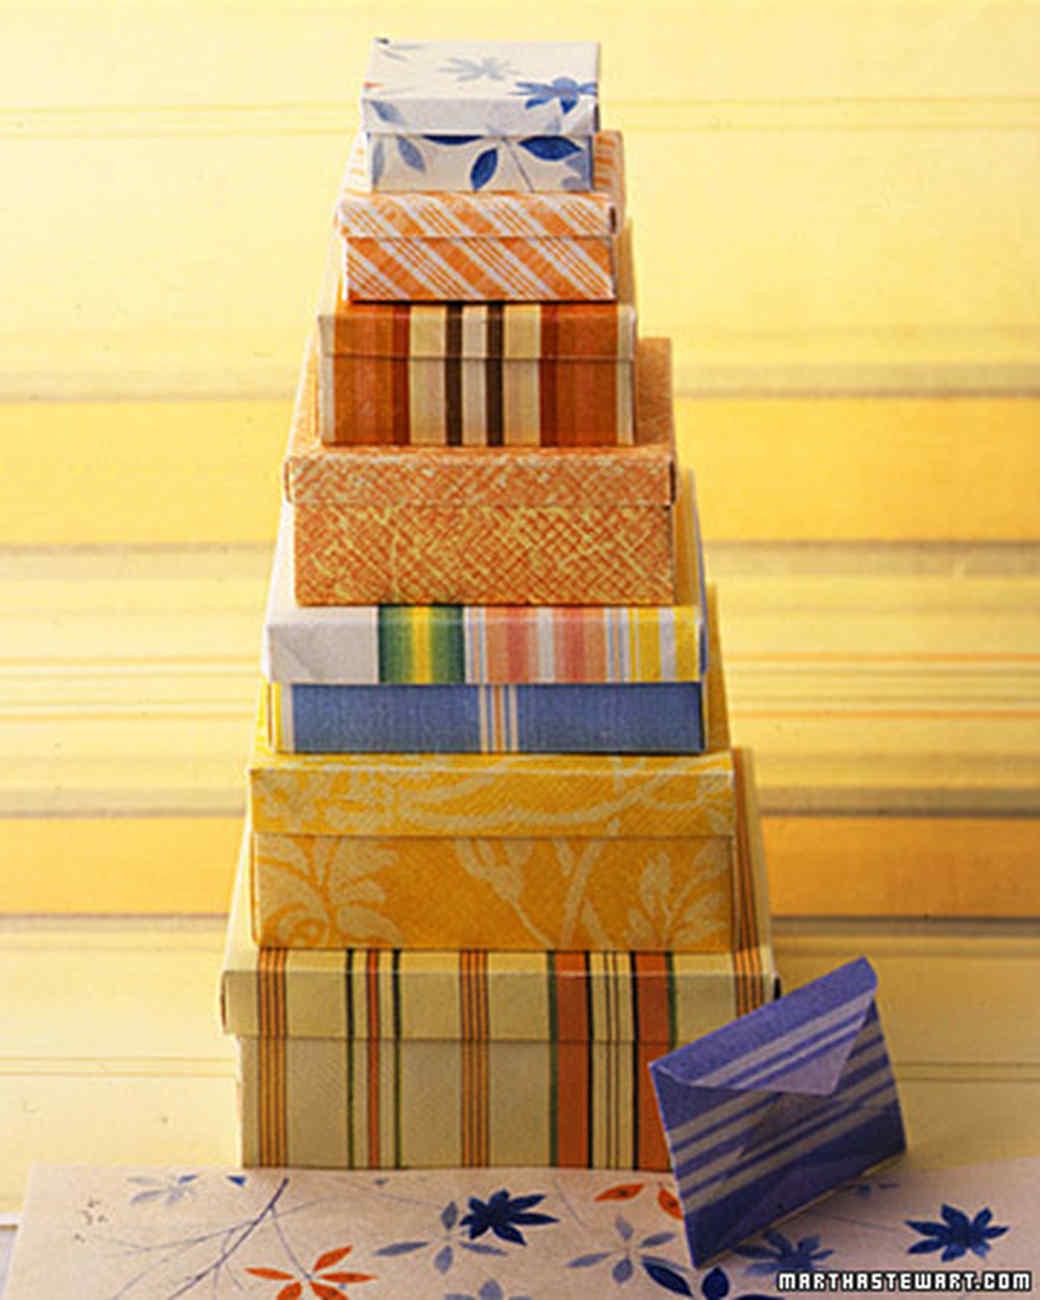 Origami Nesting Boxes